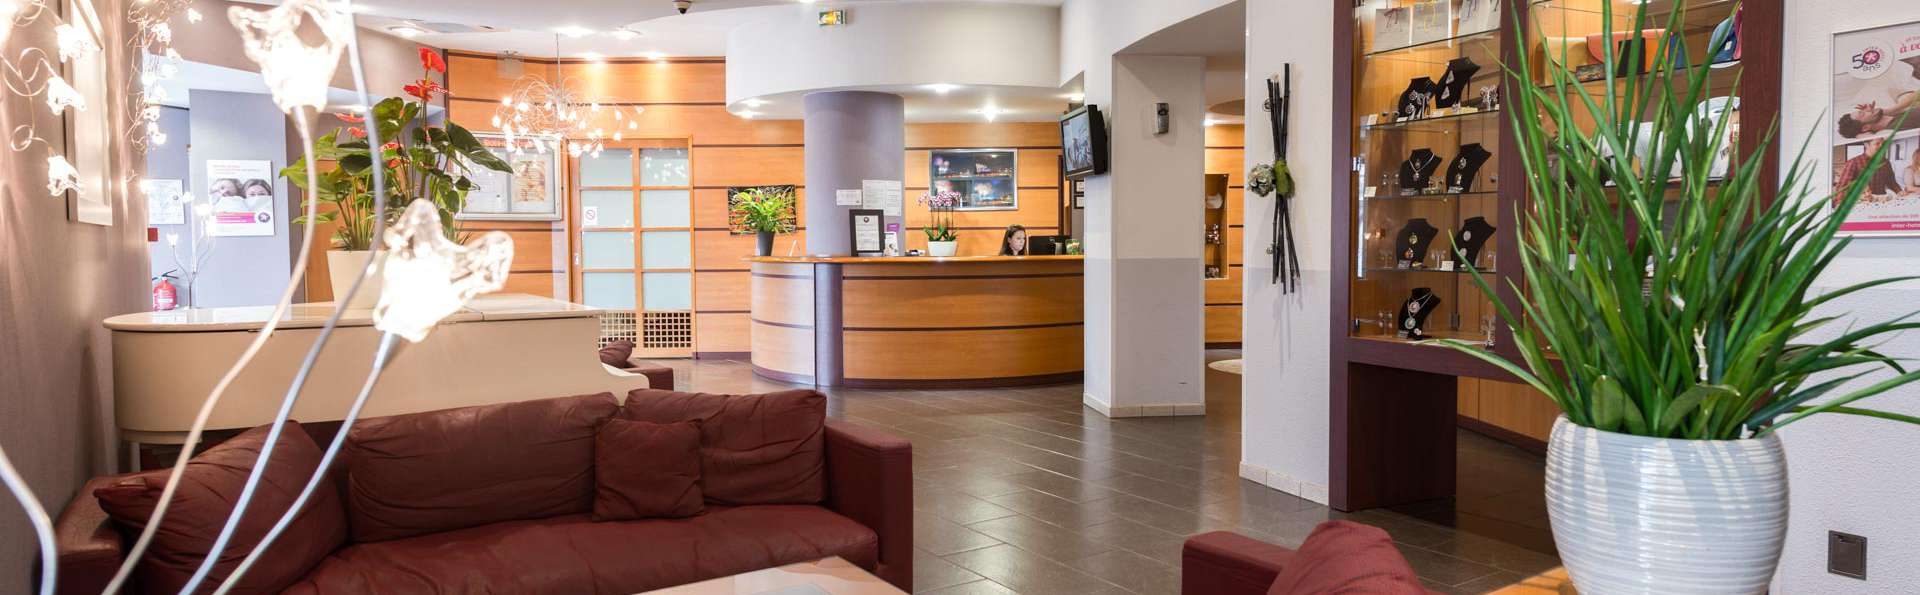 Kyriad Limoges Centre Gare Atrium - EDIT_LOBBY_01.jpg